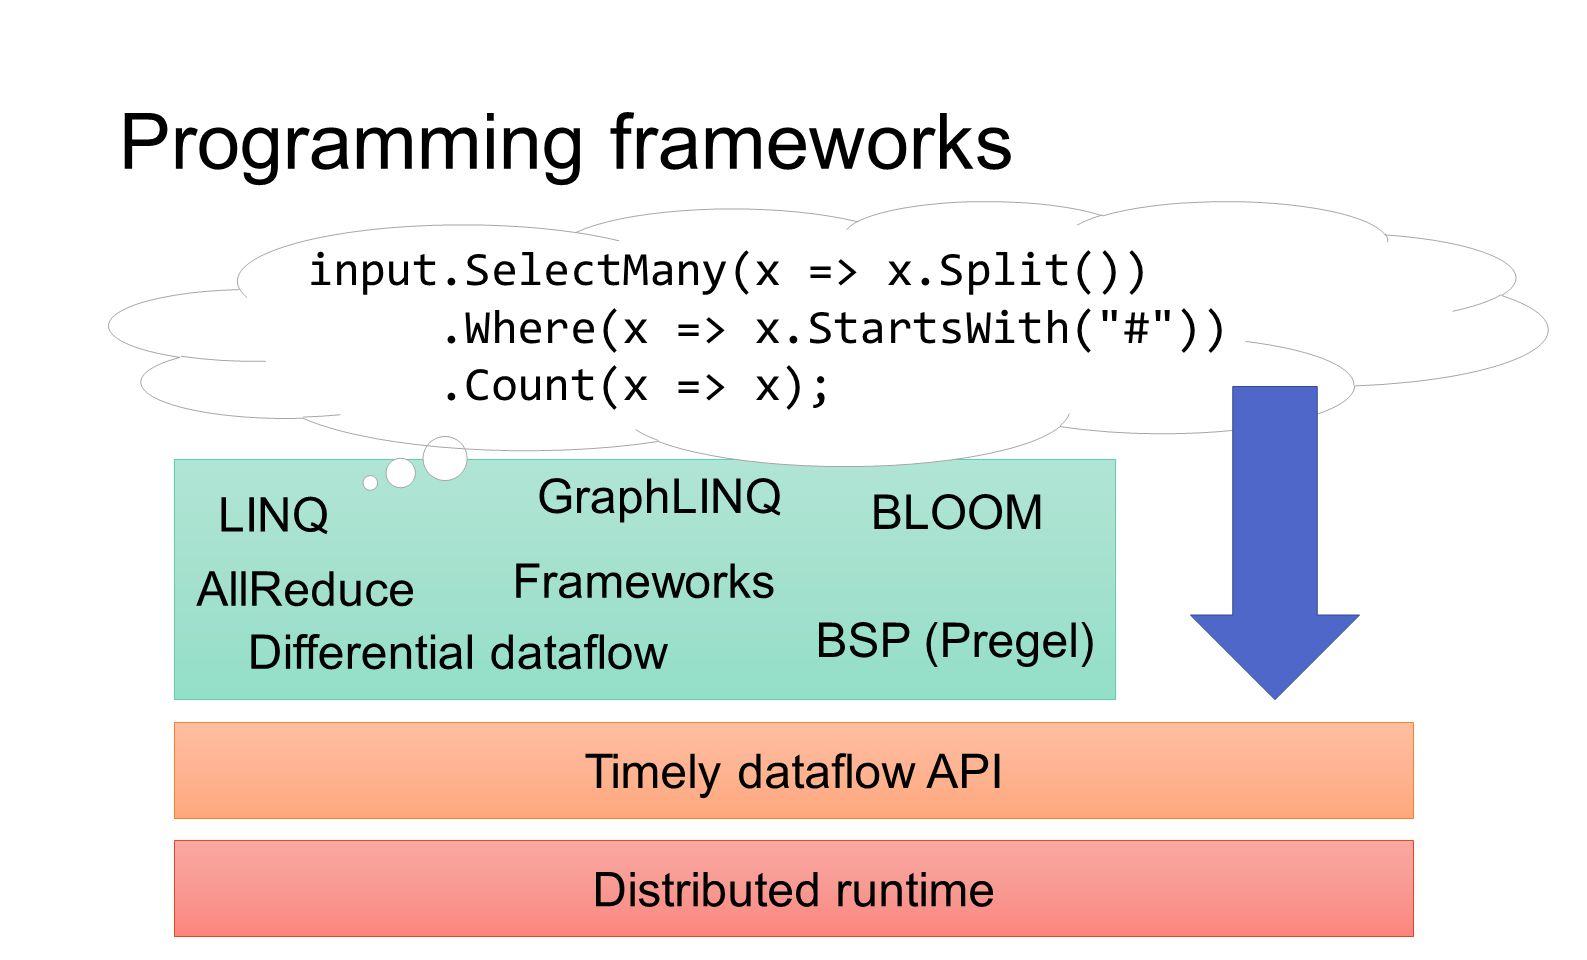 Programming frameworks Timely dataflow API Distributed runtime Frameworks LINQ GraphLINQ Differential dataflow BSP (Pregel) BLOOM AllReduce input.Sele